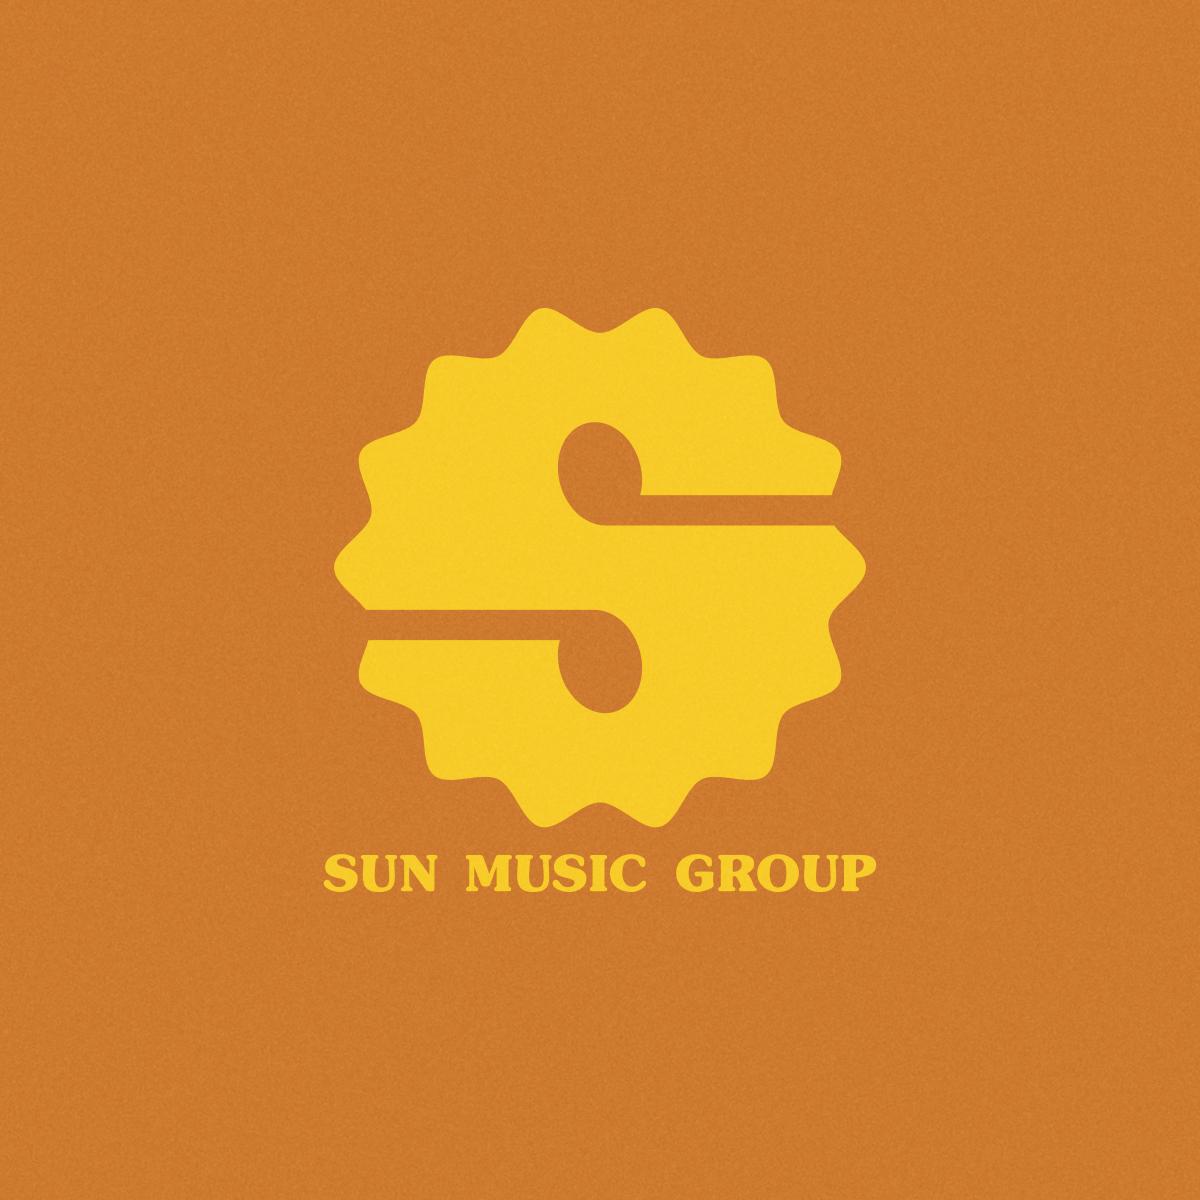 SunMusicGroup